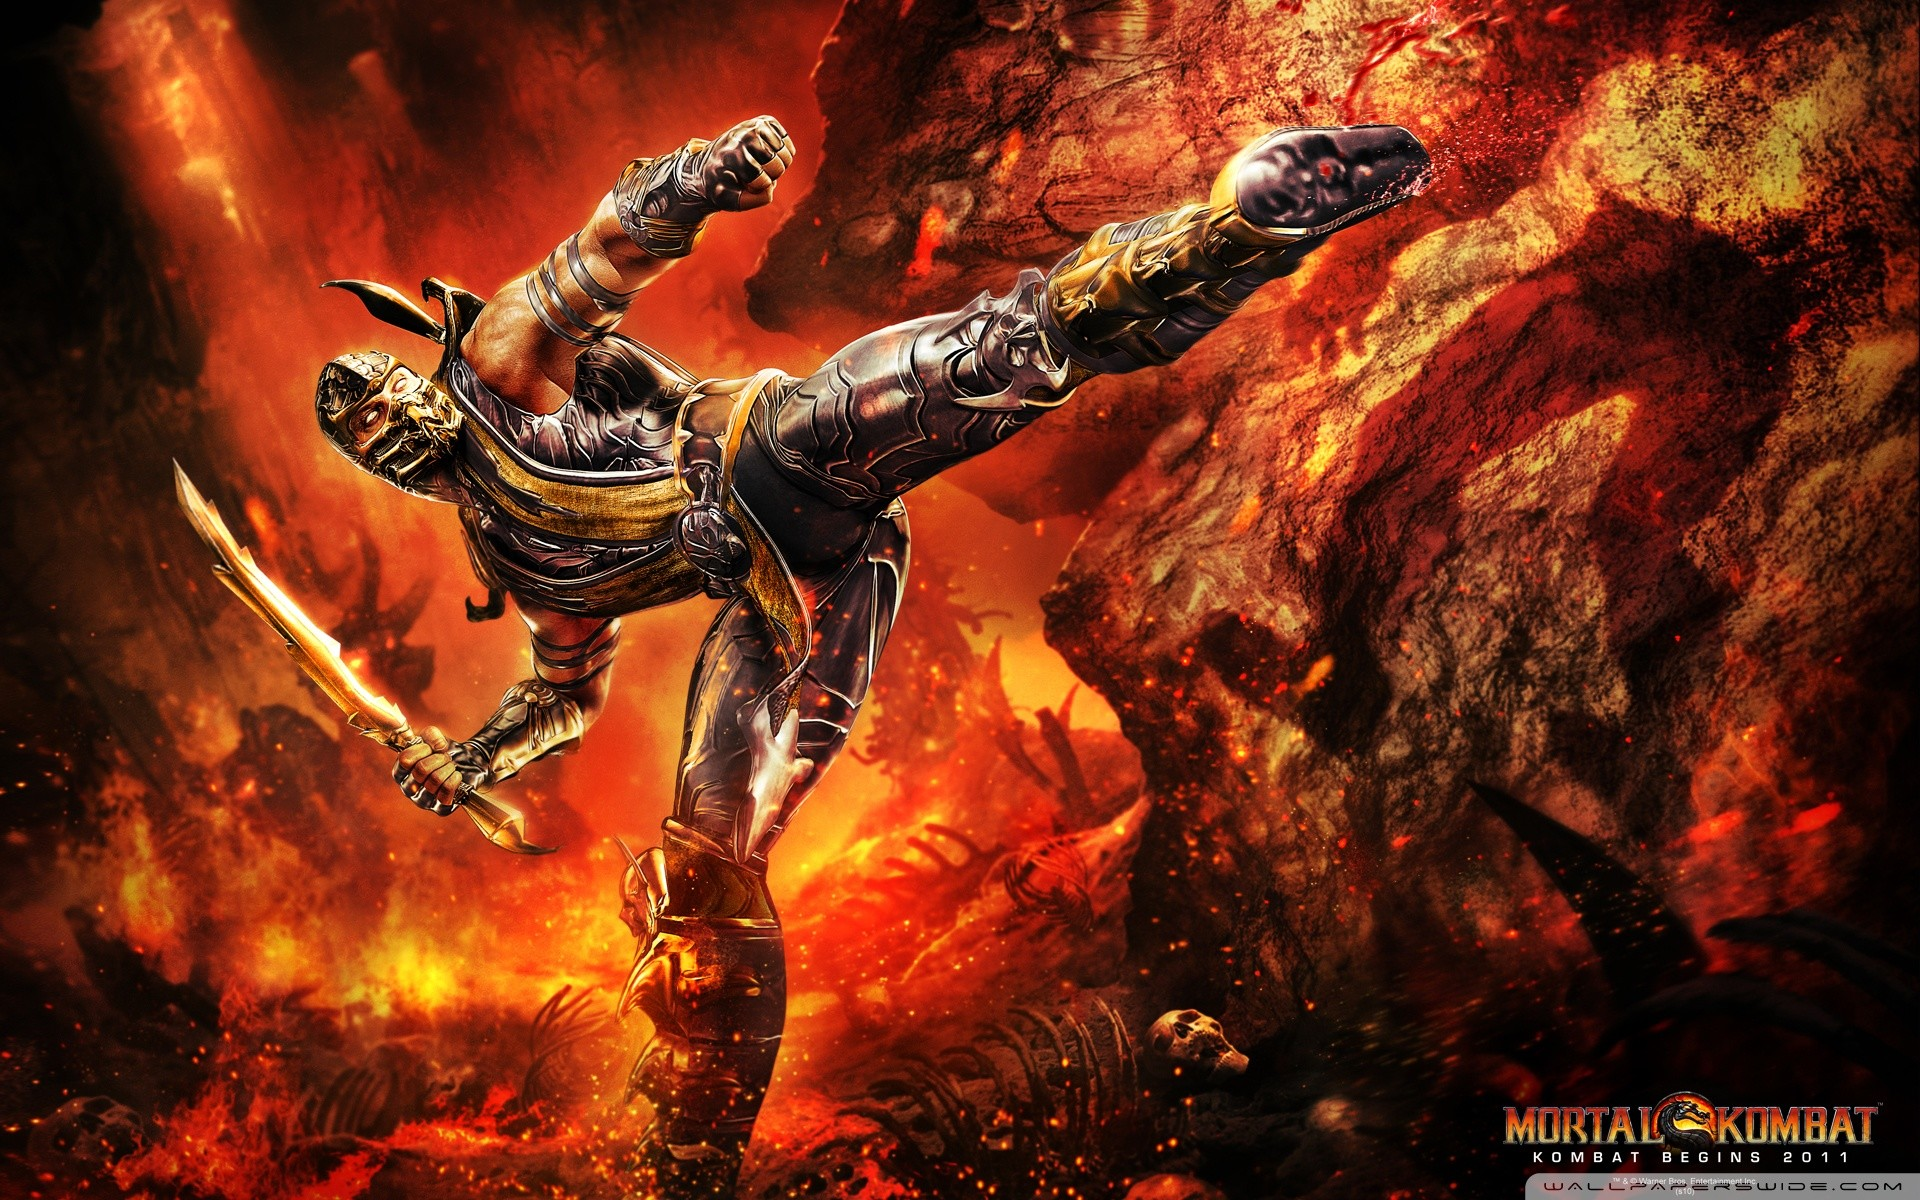 Mortal Kombat Scorpion HD desktop wallpaper High Definition